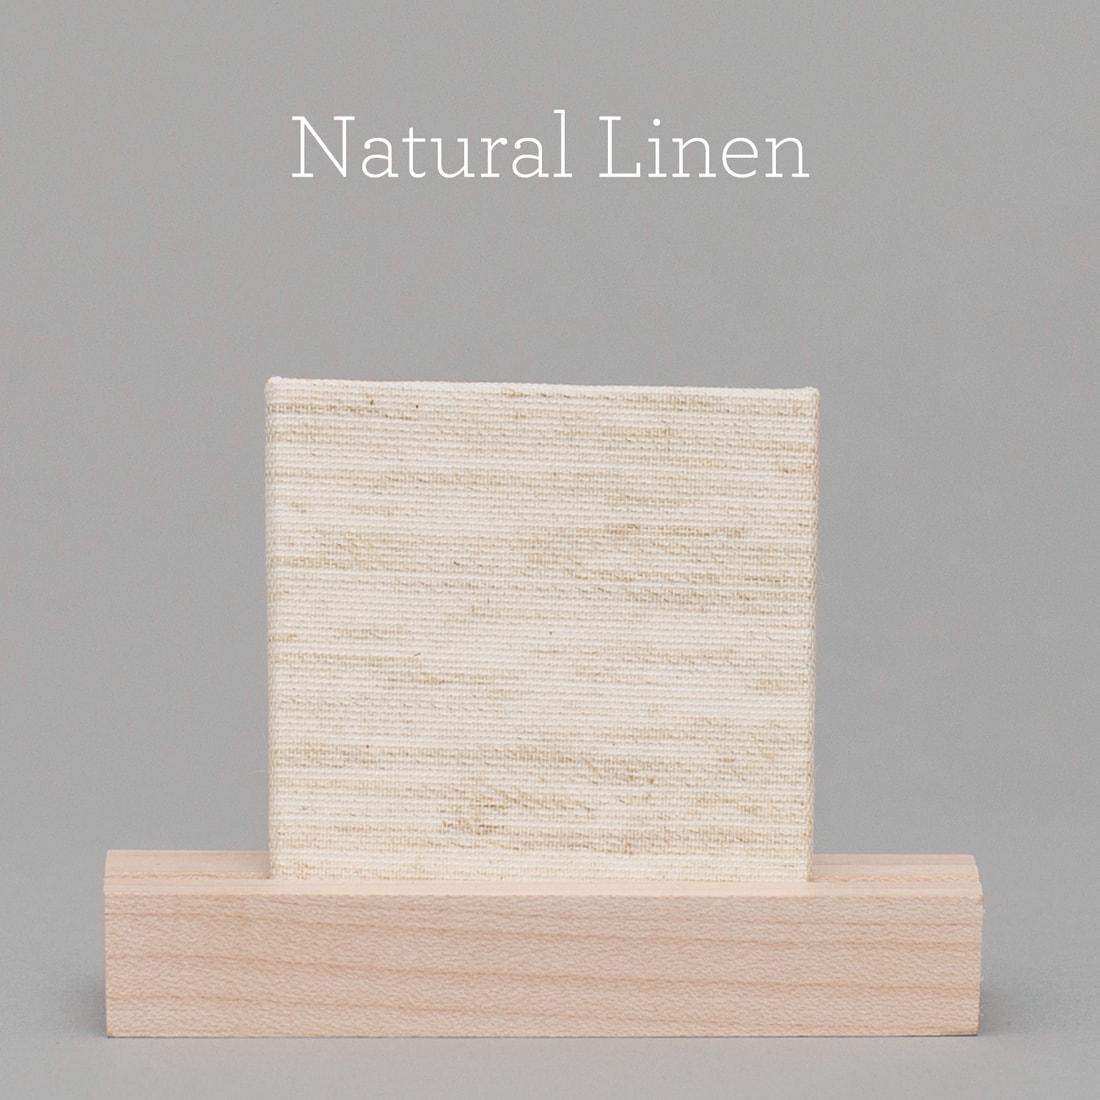 NaturalLinen.jpg